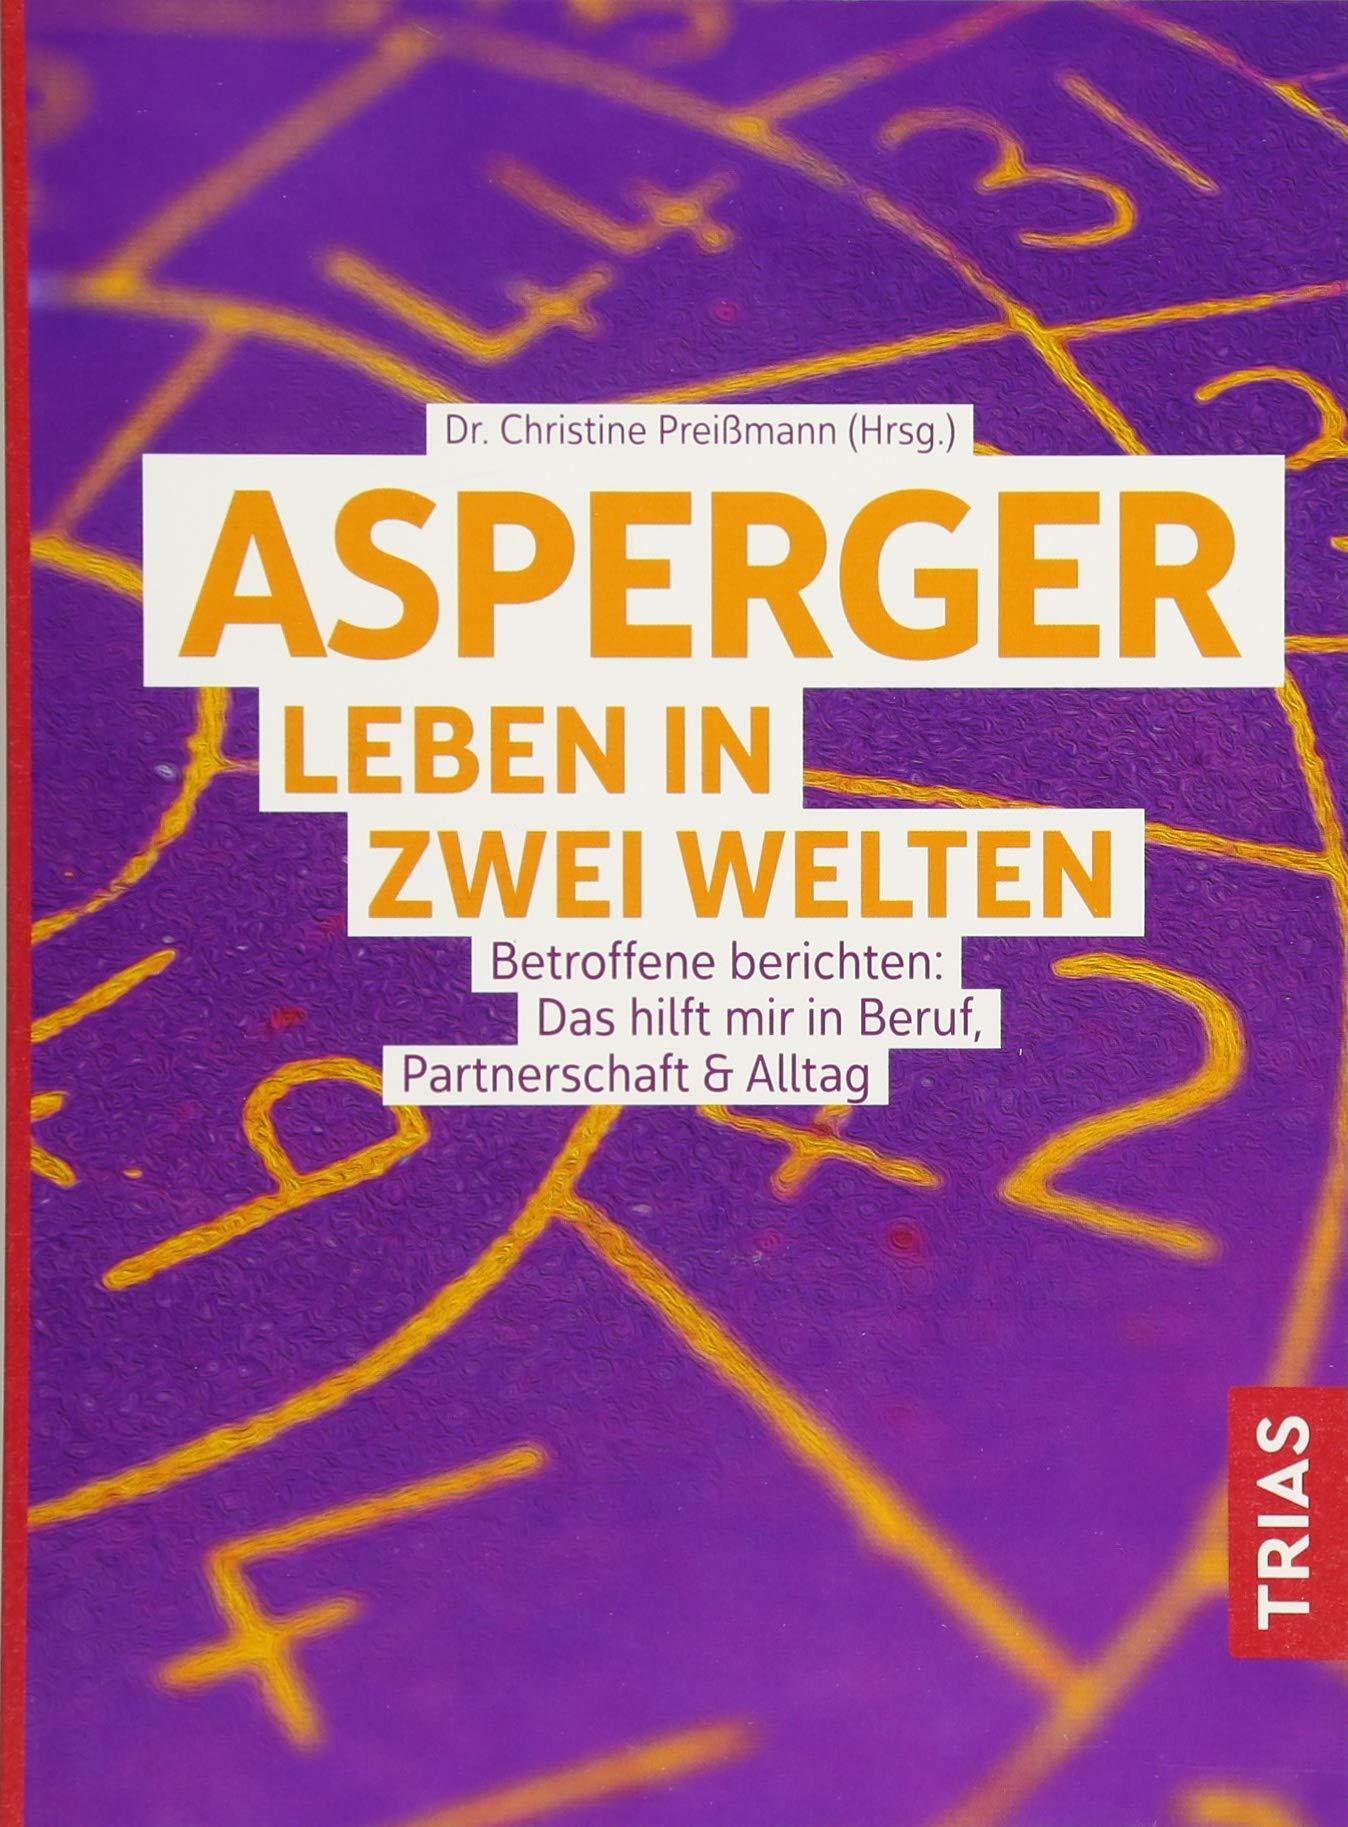 Asperger: Leben in zwei Welten: Betroffene berichten: Das hilft mir in Beruf, Partnerschaft & Alltag